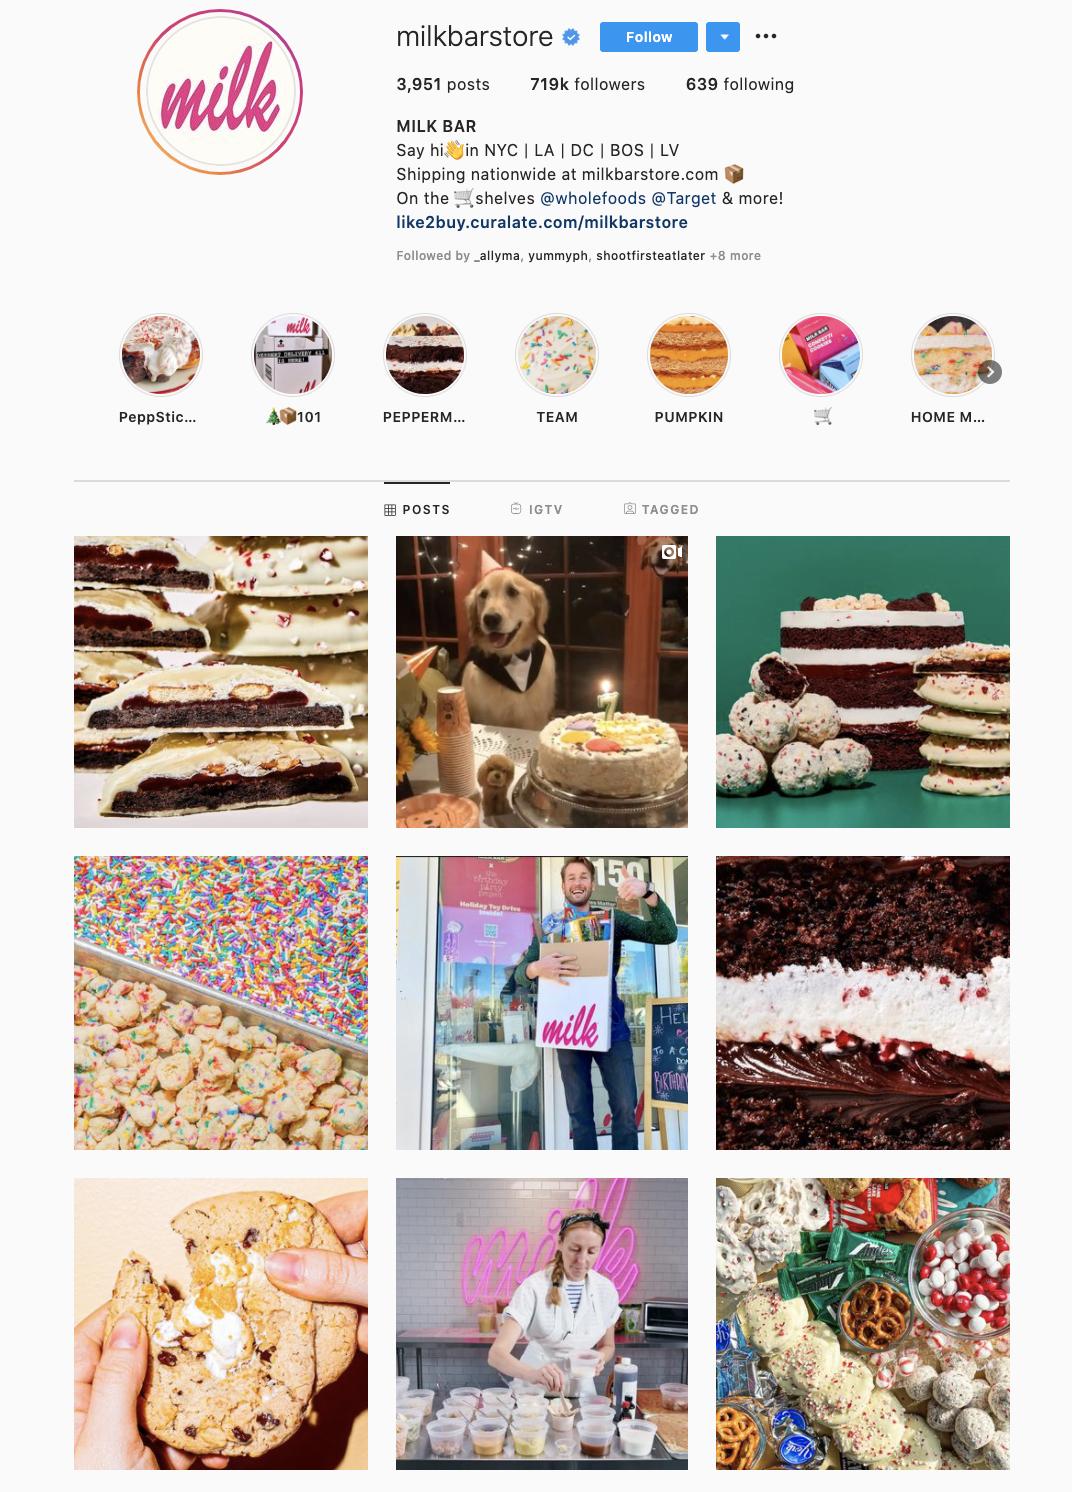 instagram content strategy milkbarstore